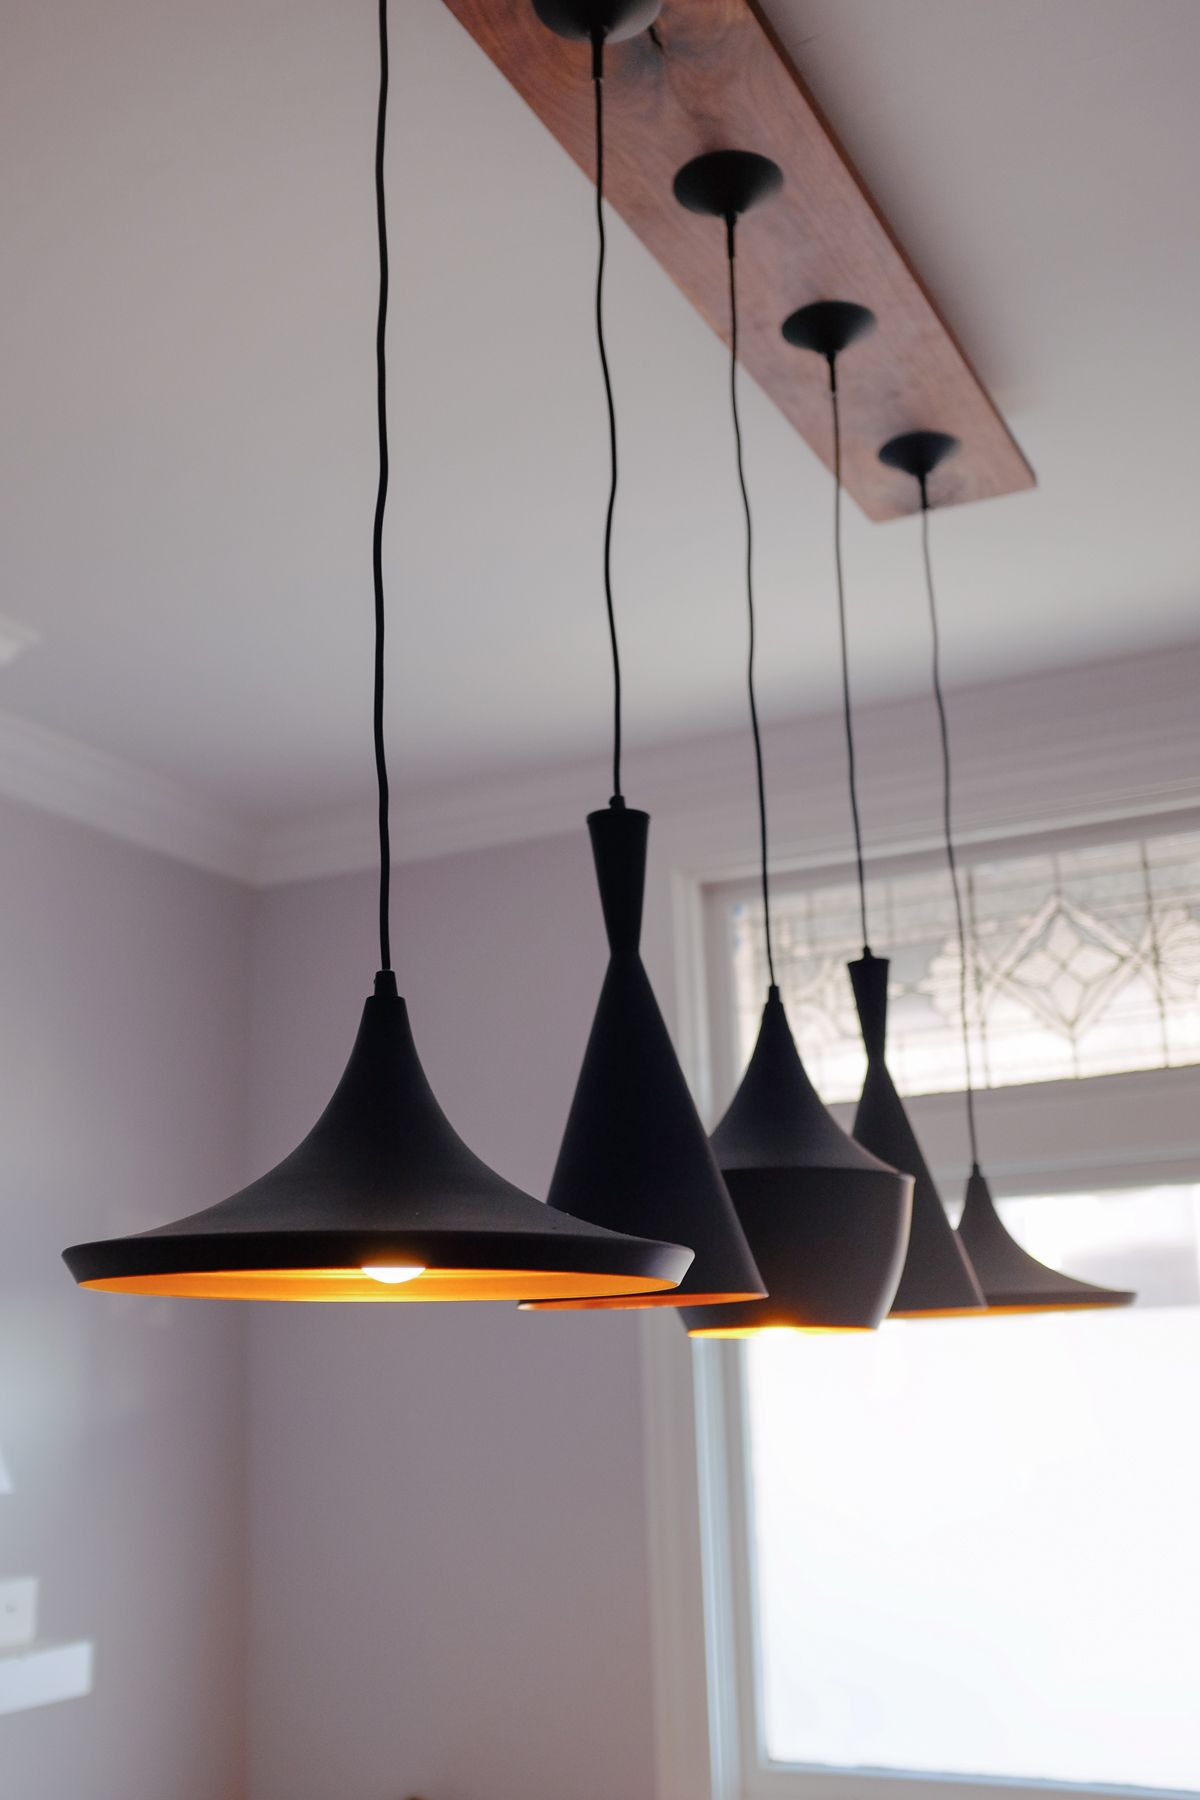 Diy Pendant Light Canopy Diy Pendant Light Diy Hanging Light